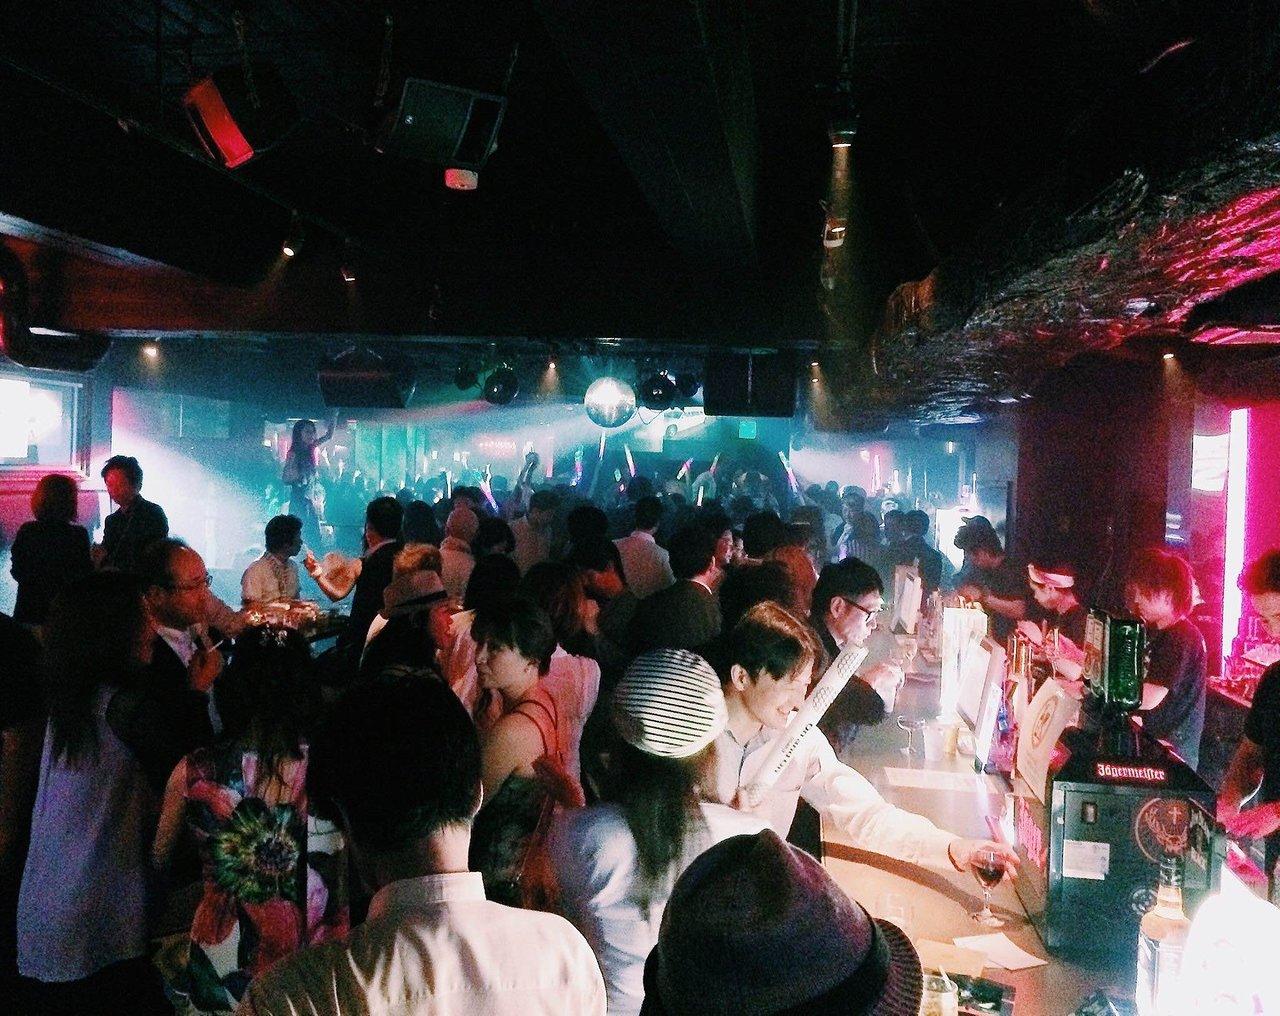 OSAKA DANCE CLUBS Osaka-no1-disco